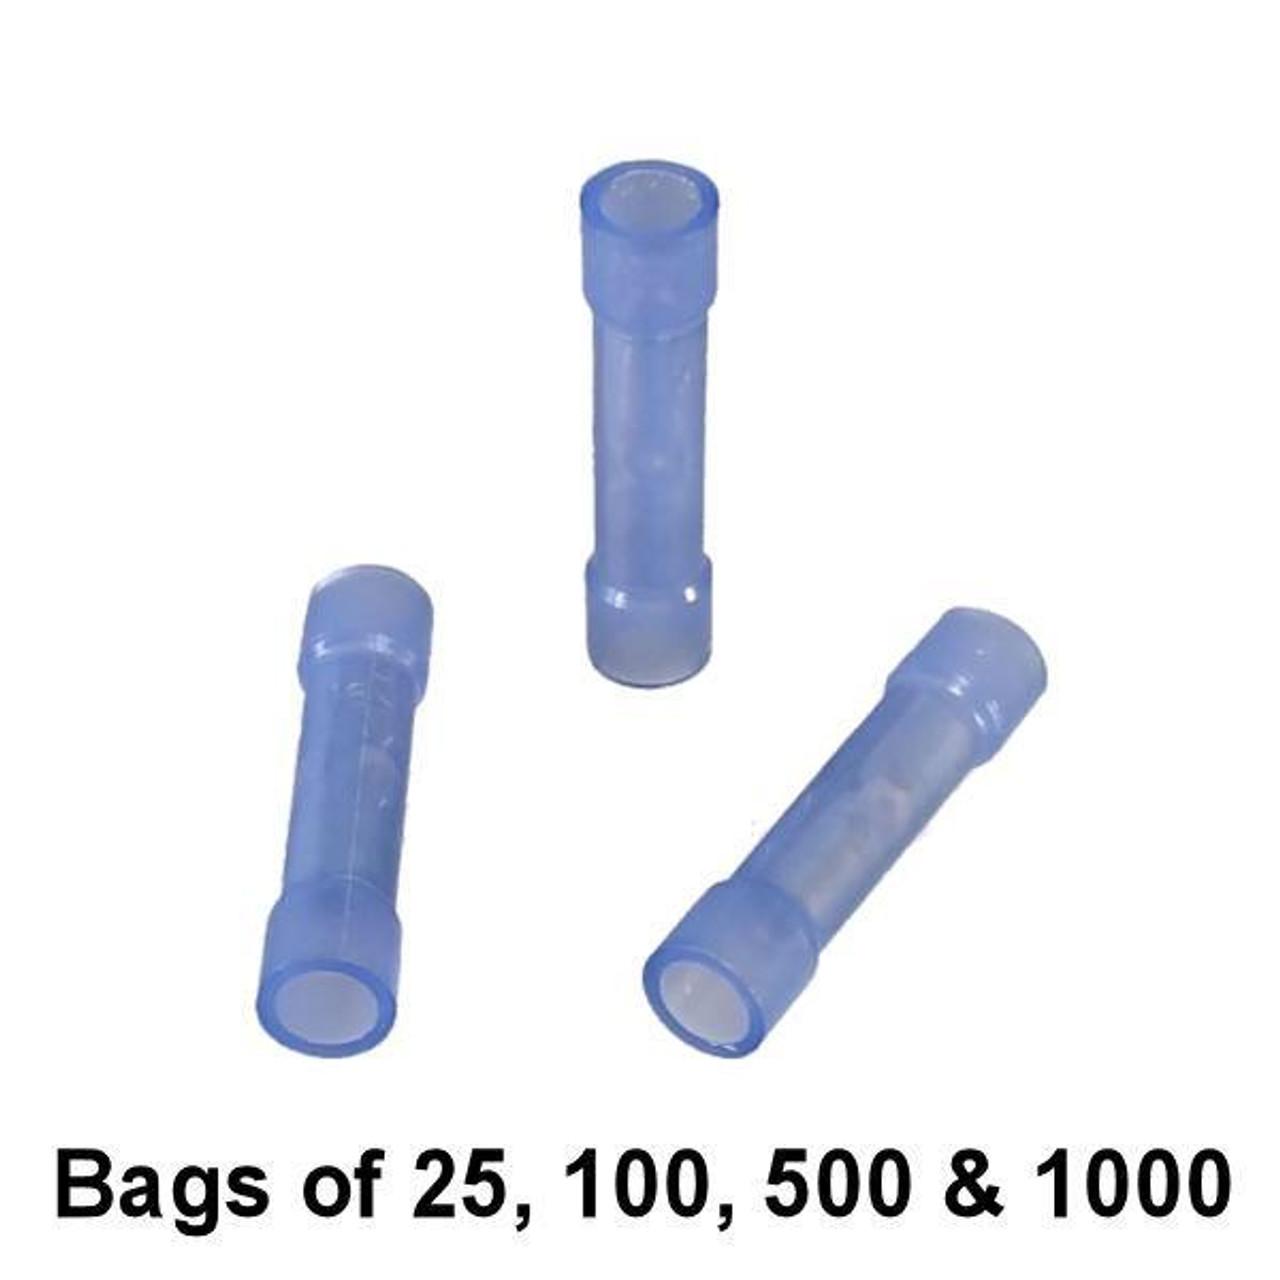 Blue Nylon Butt Connector - Bulk / Wholesale